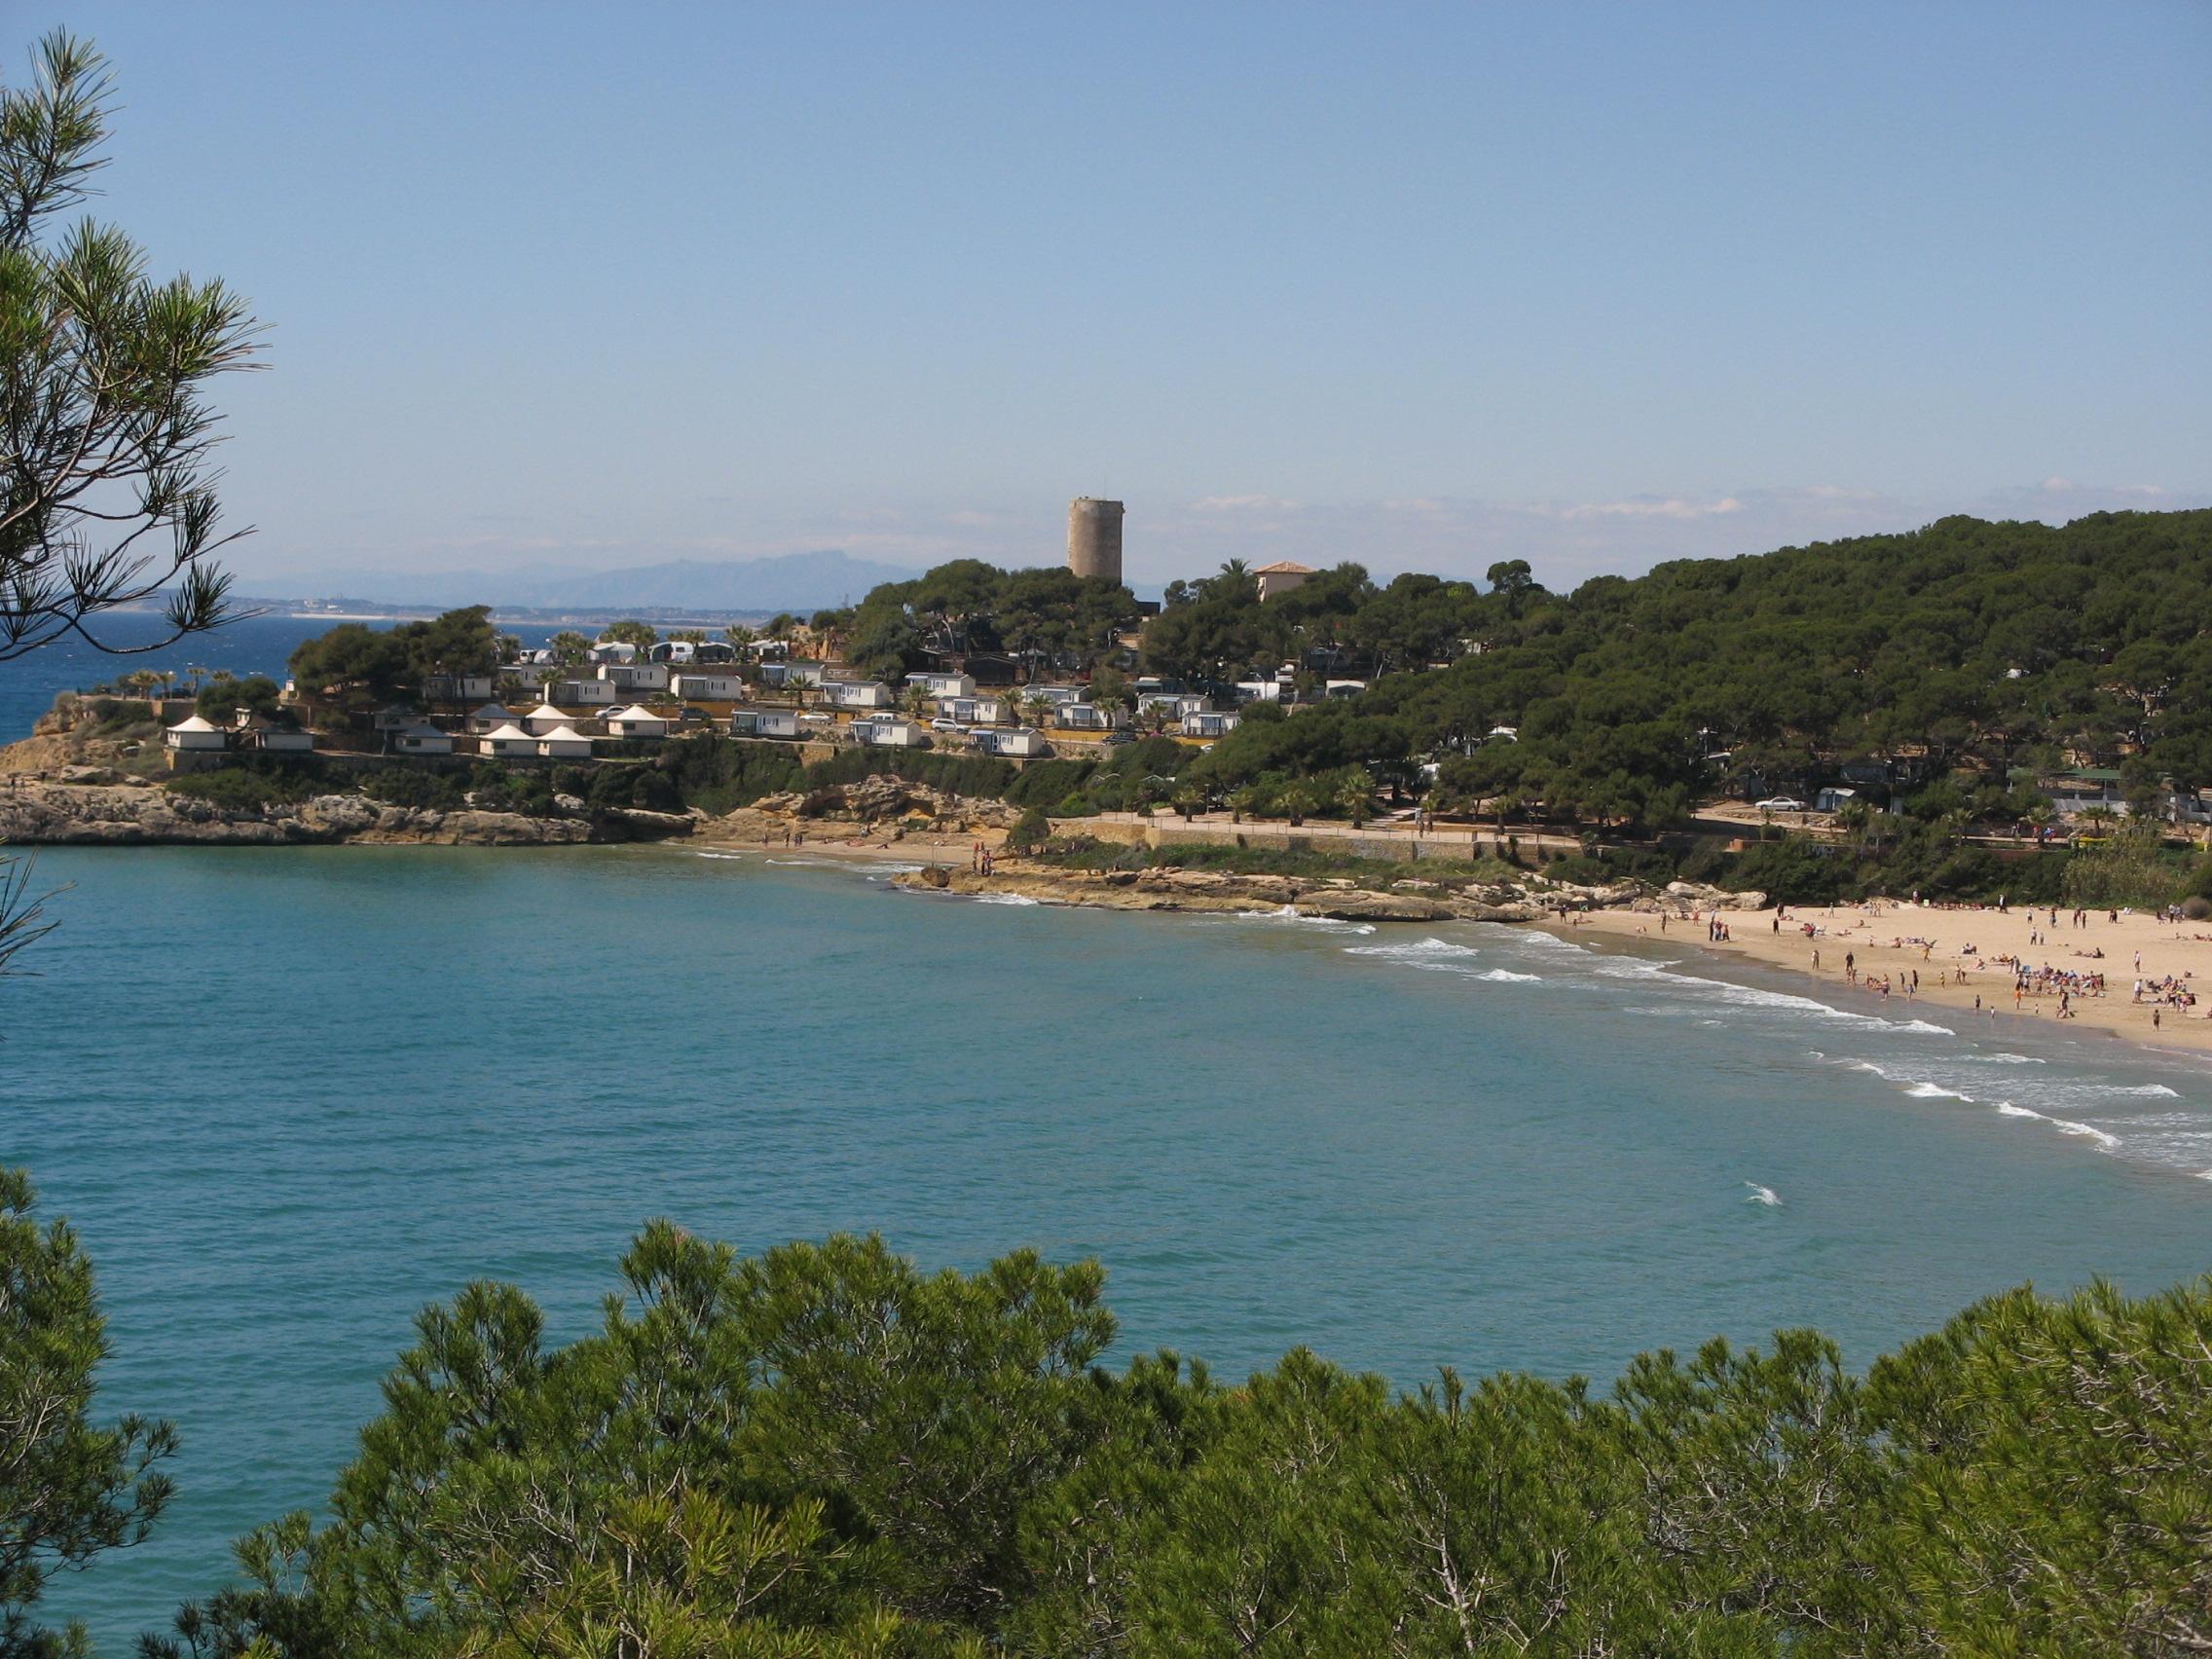 Playa Cala del Gallito